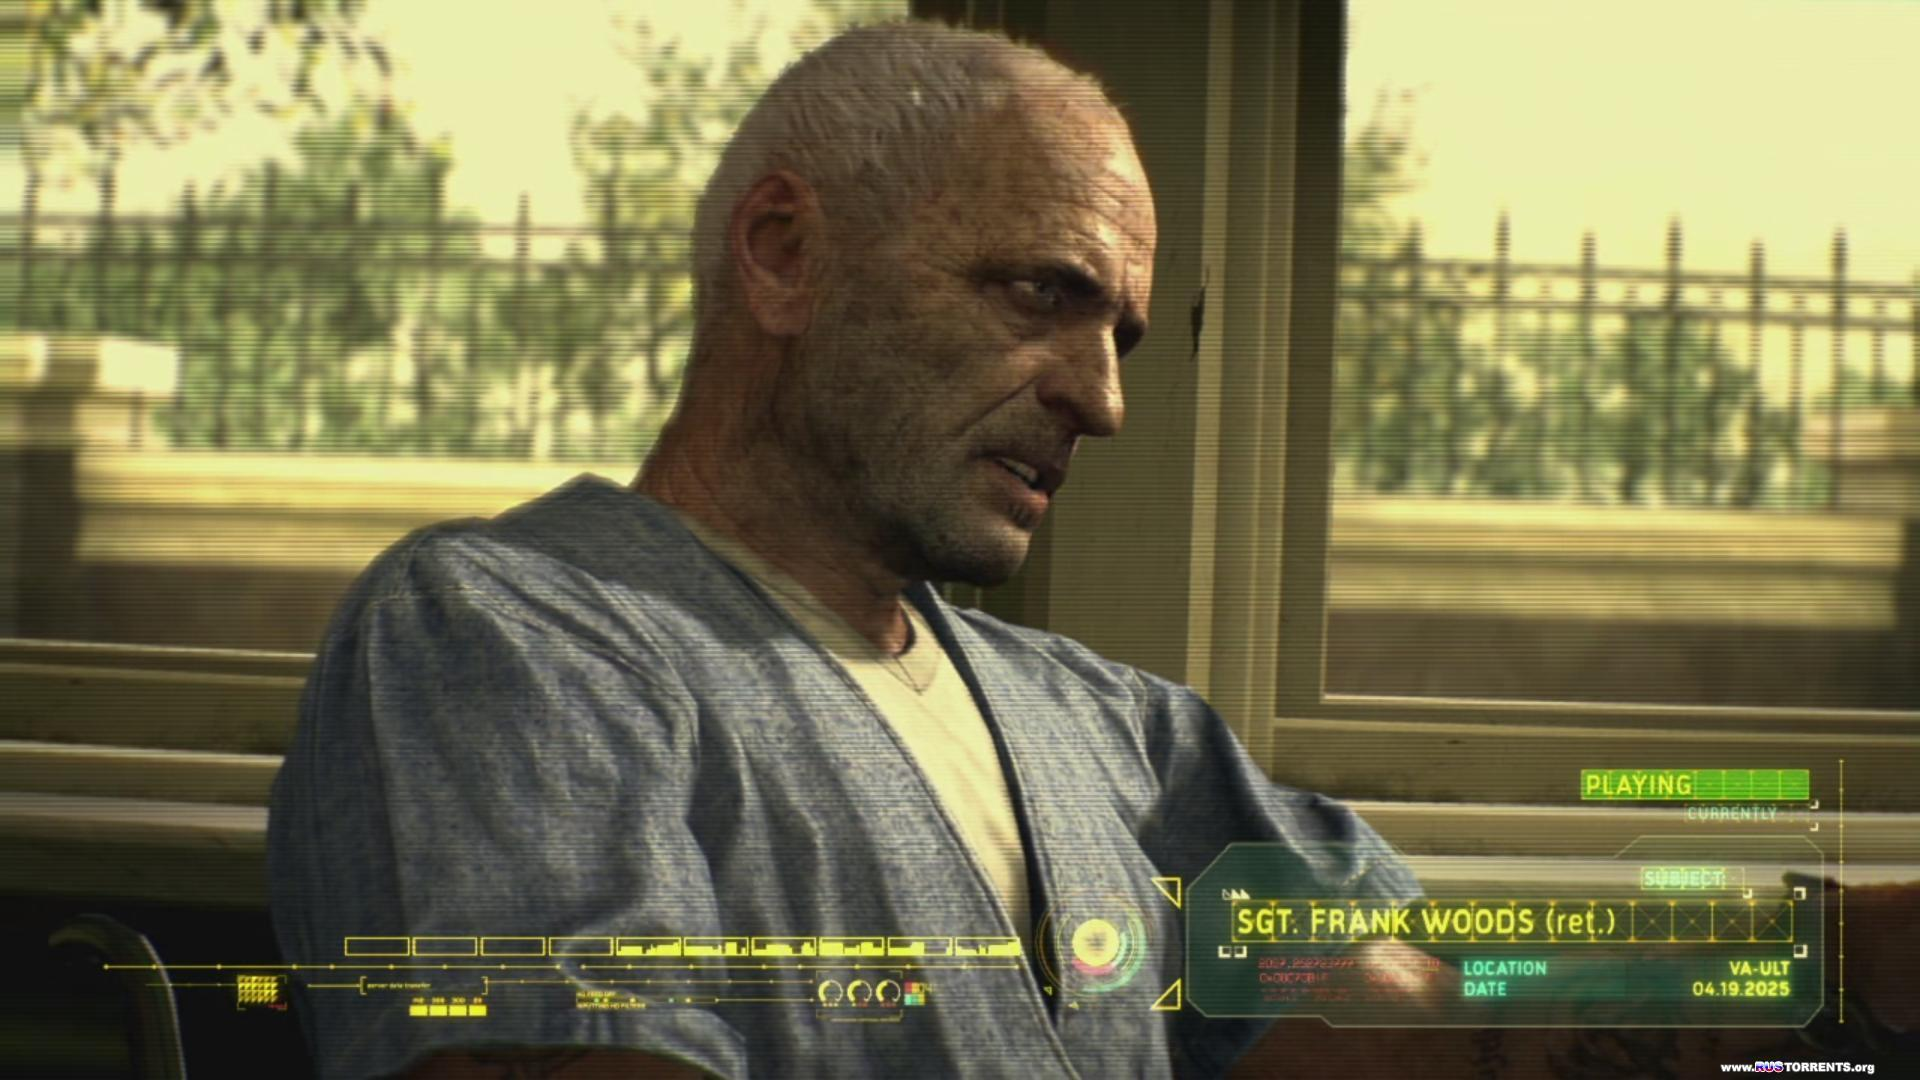 Call of Duty: Black Ops 2 - Digital Deluxe Edition [v 1.0.0.1u3] | Repack �� Fenixx